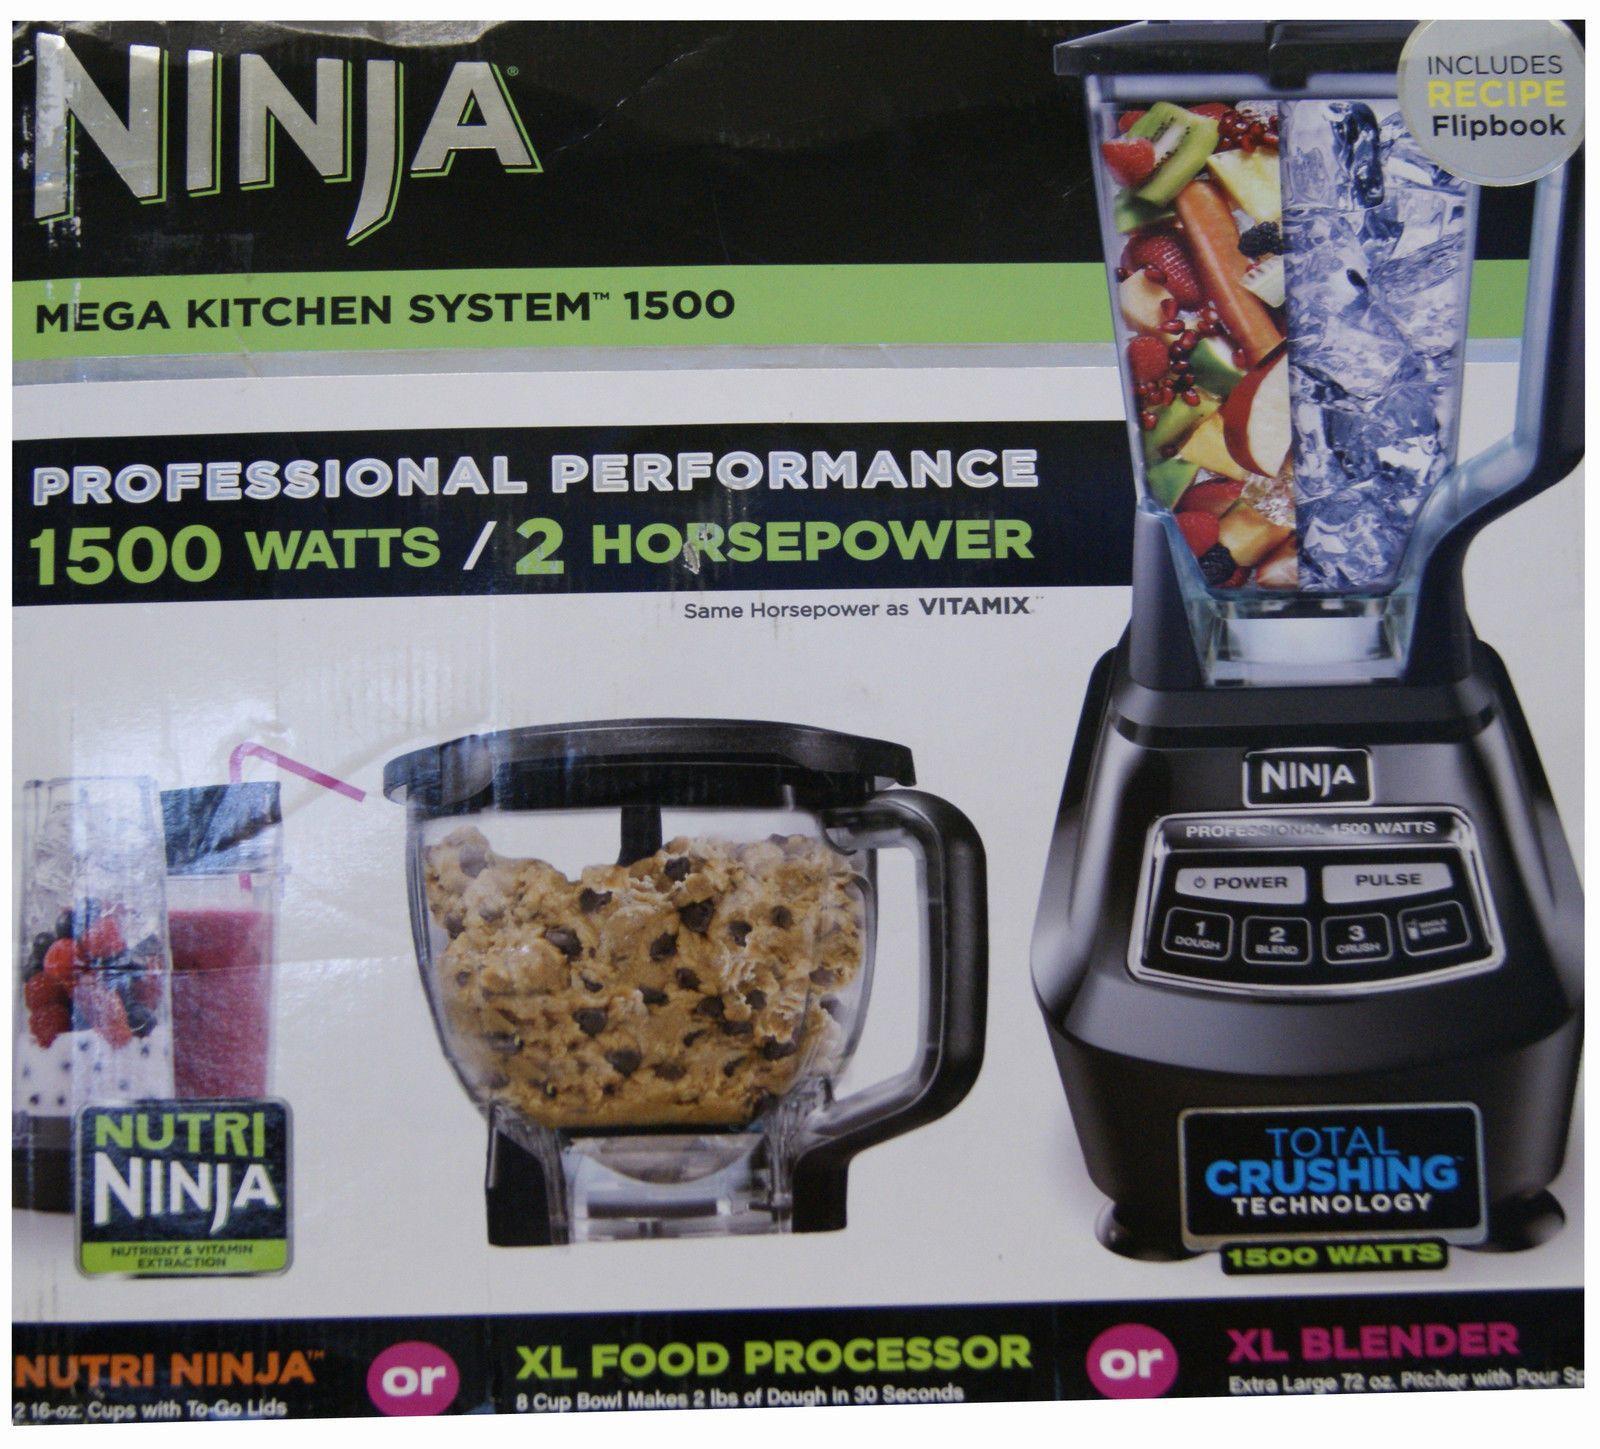 Ninja mega kitchen system 1500w 2hp food processor blender bl773co - Blenders Countertop 133704 Bl770 Ninja Mega Kitchen System 1500w Blender Nutri 2 Hp In